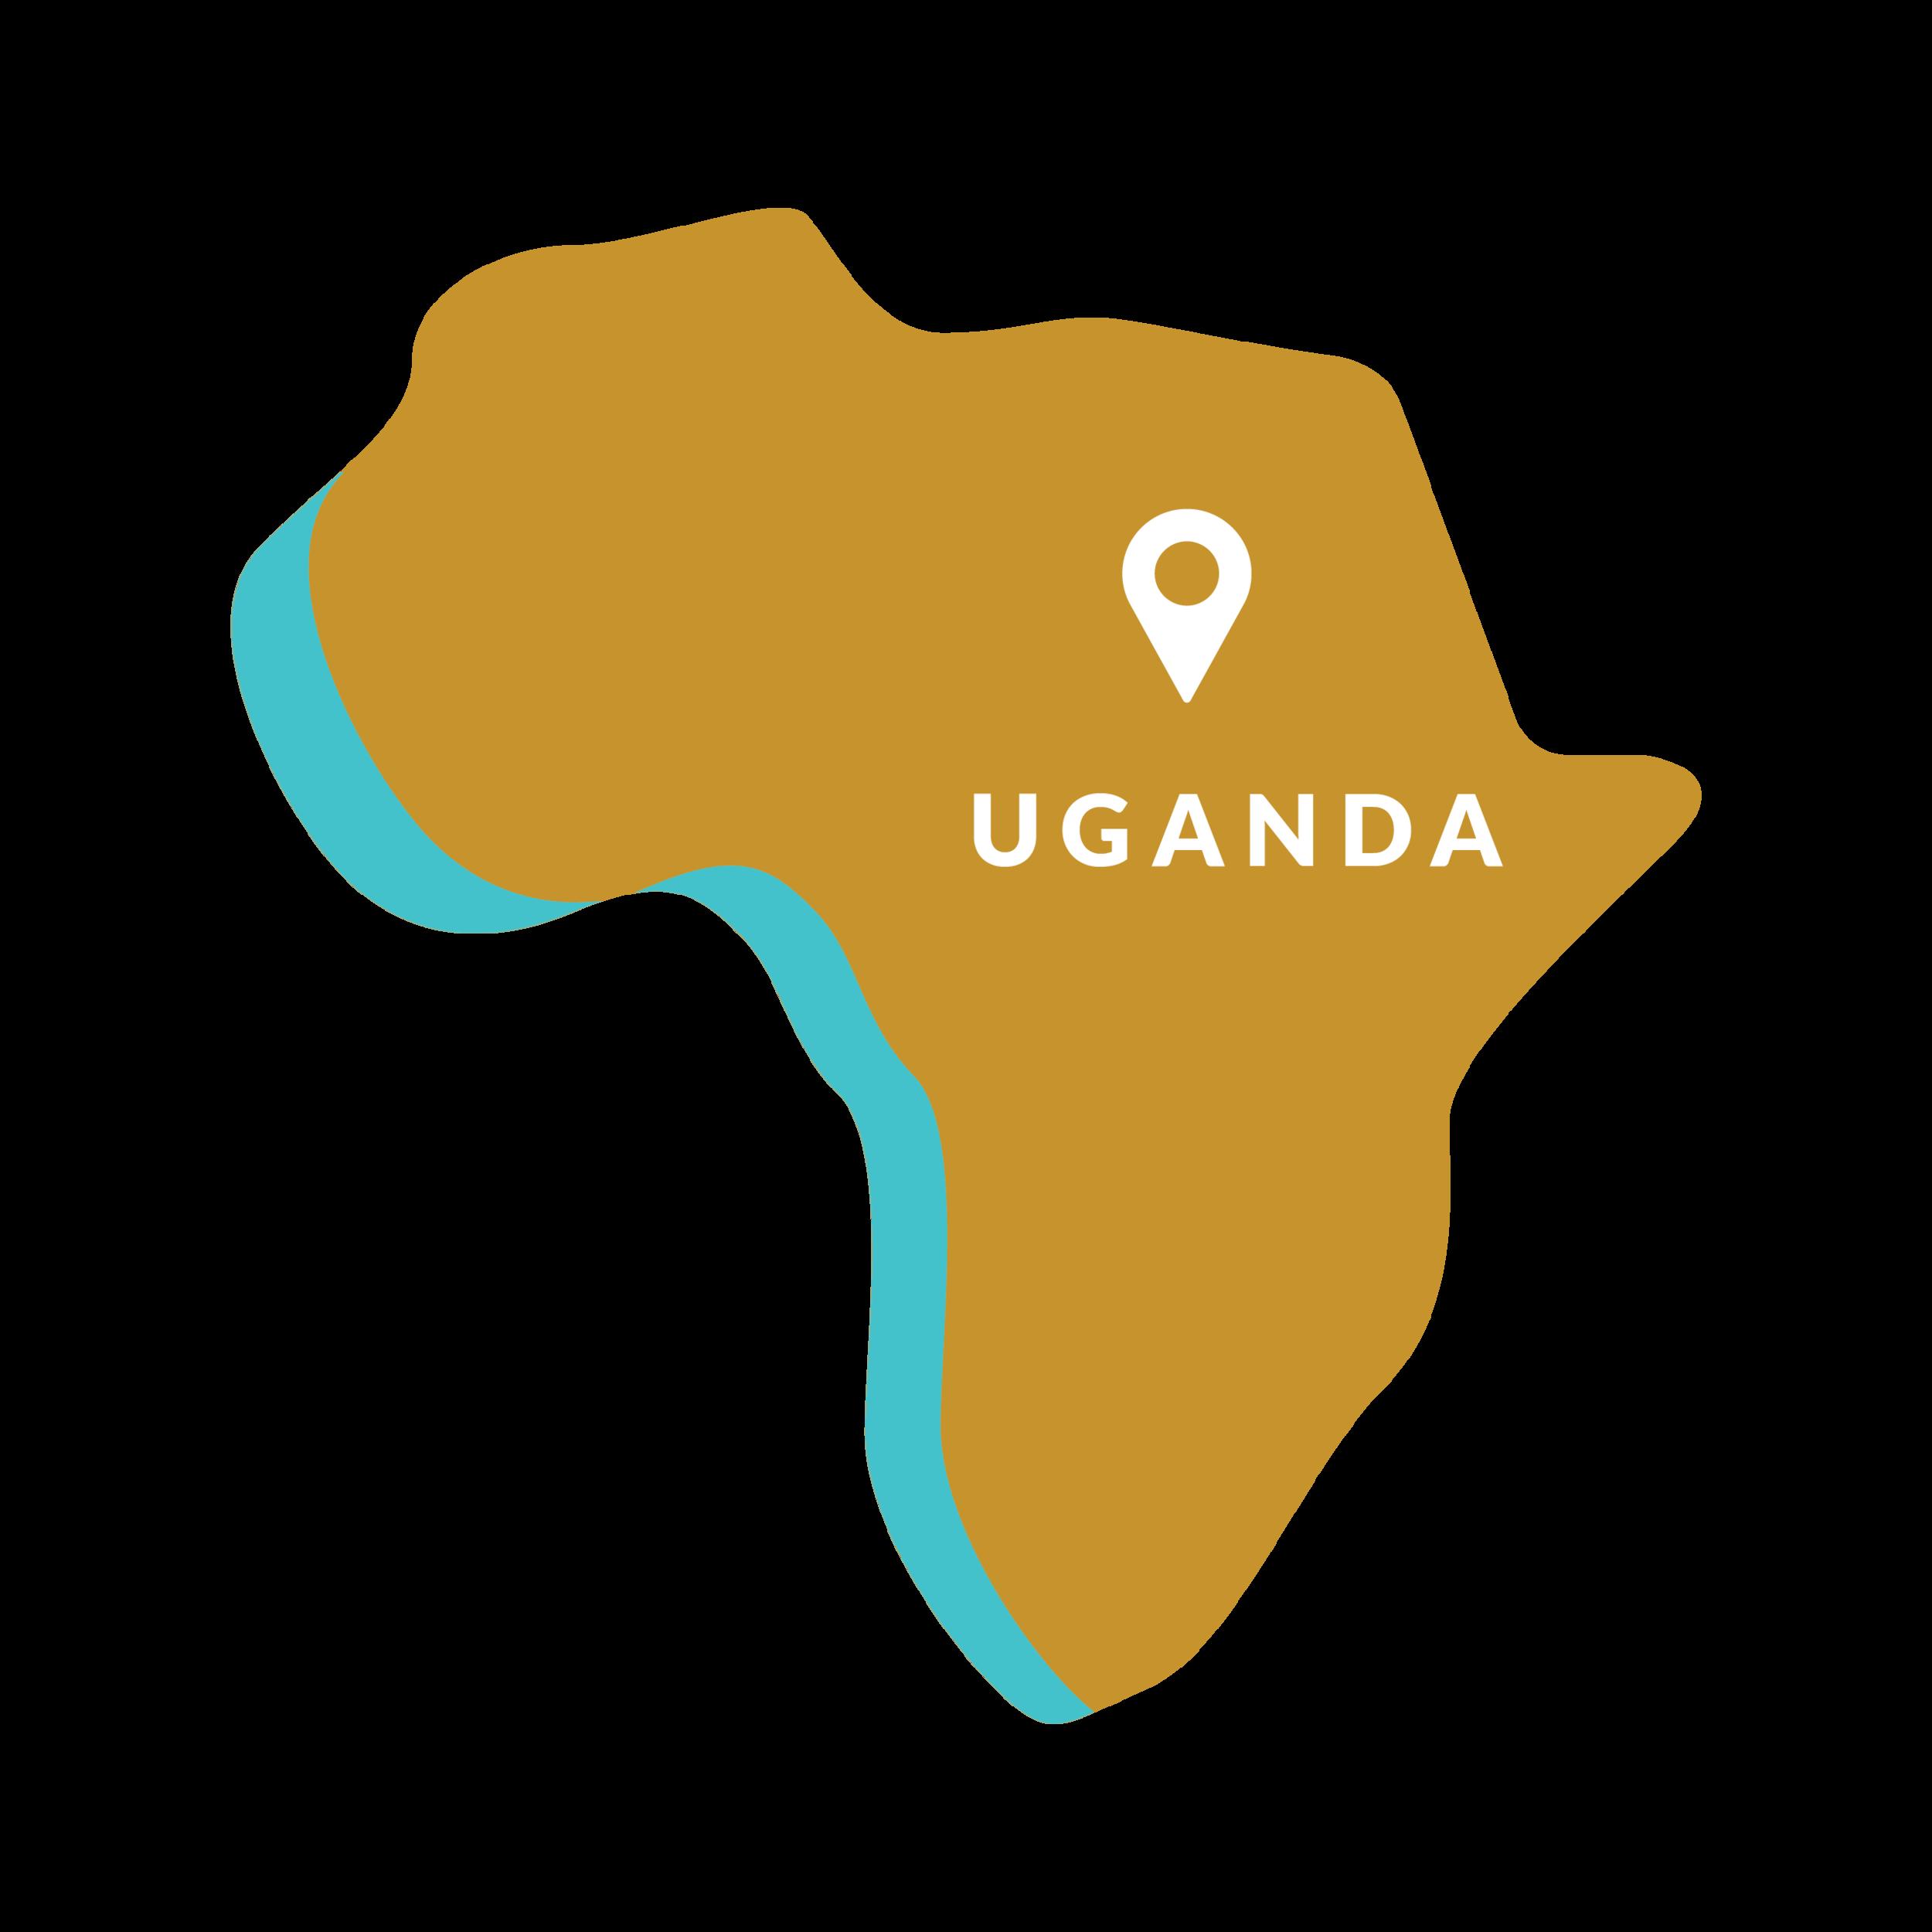 uganda-01.png